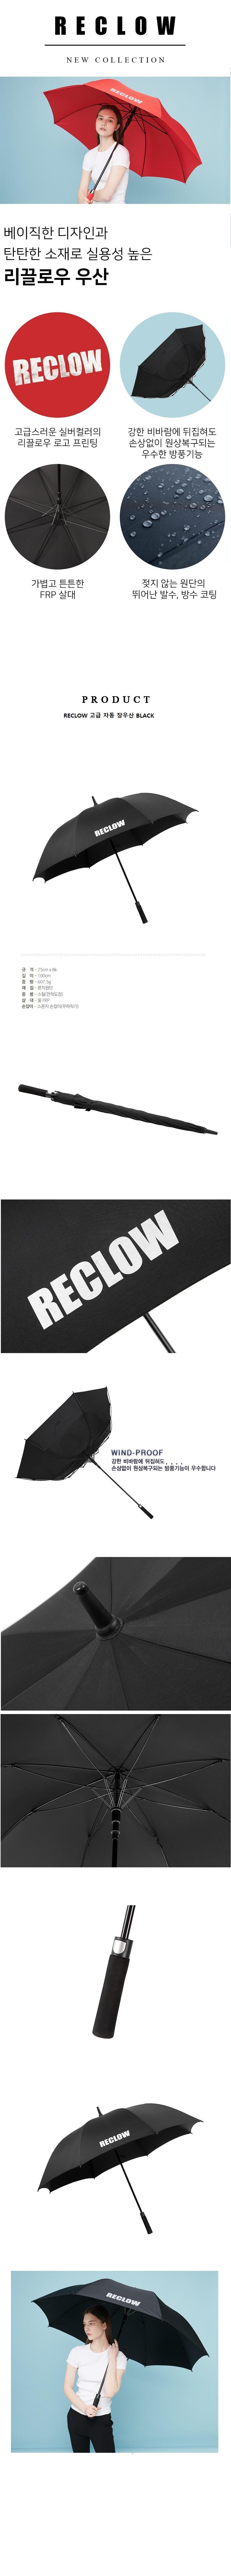 RECLOW 고급 자동 장우산 BLACK.jpg